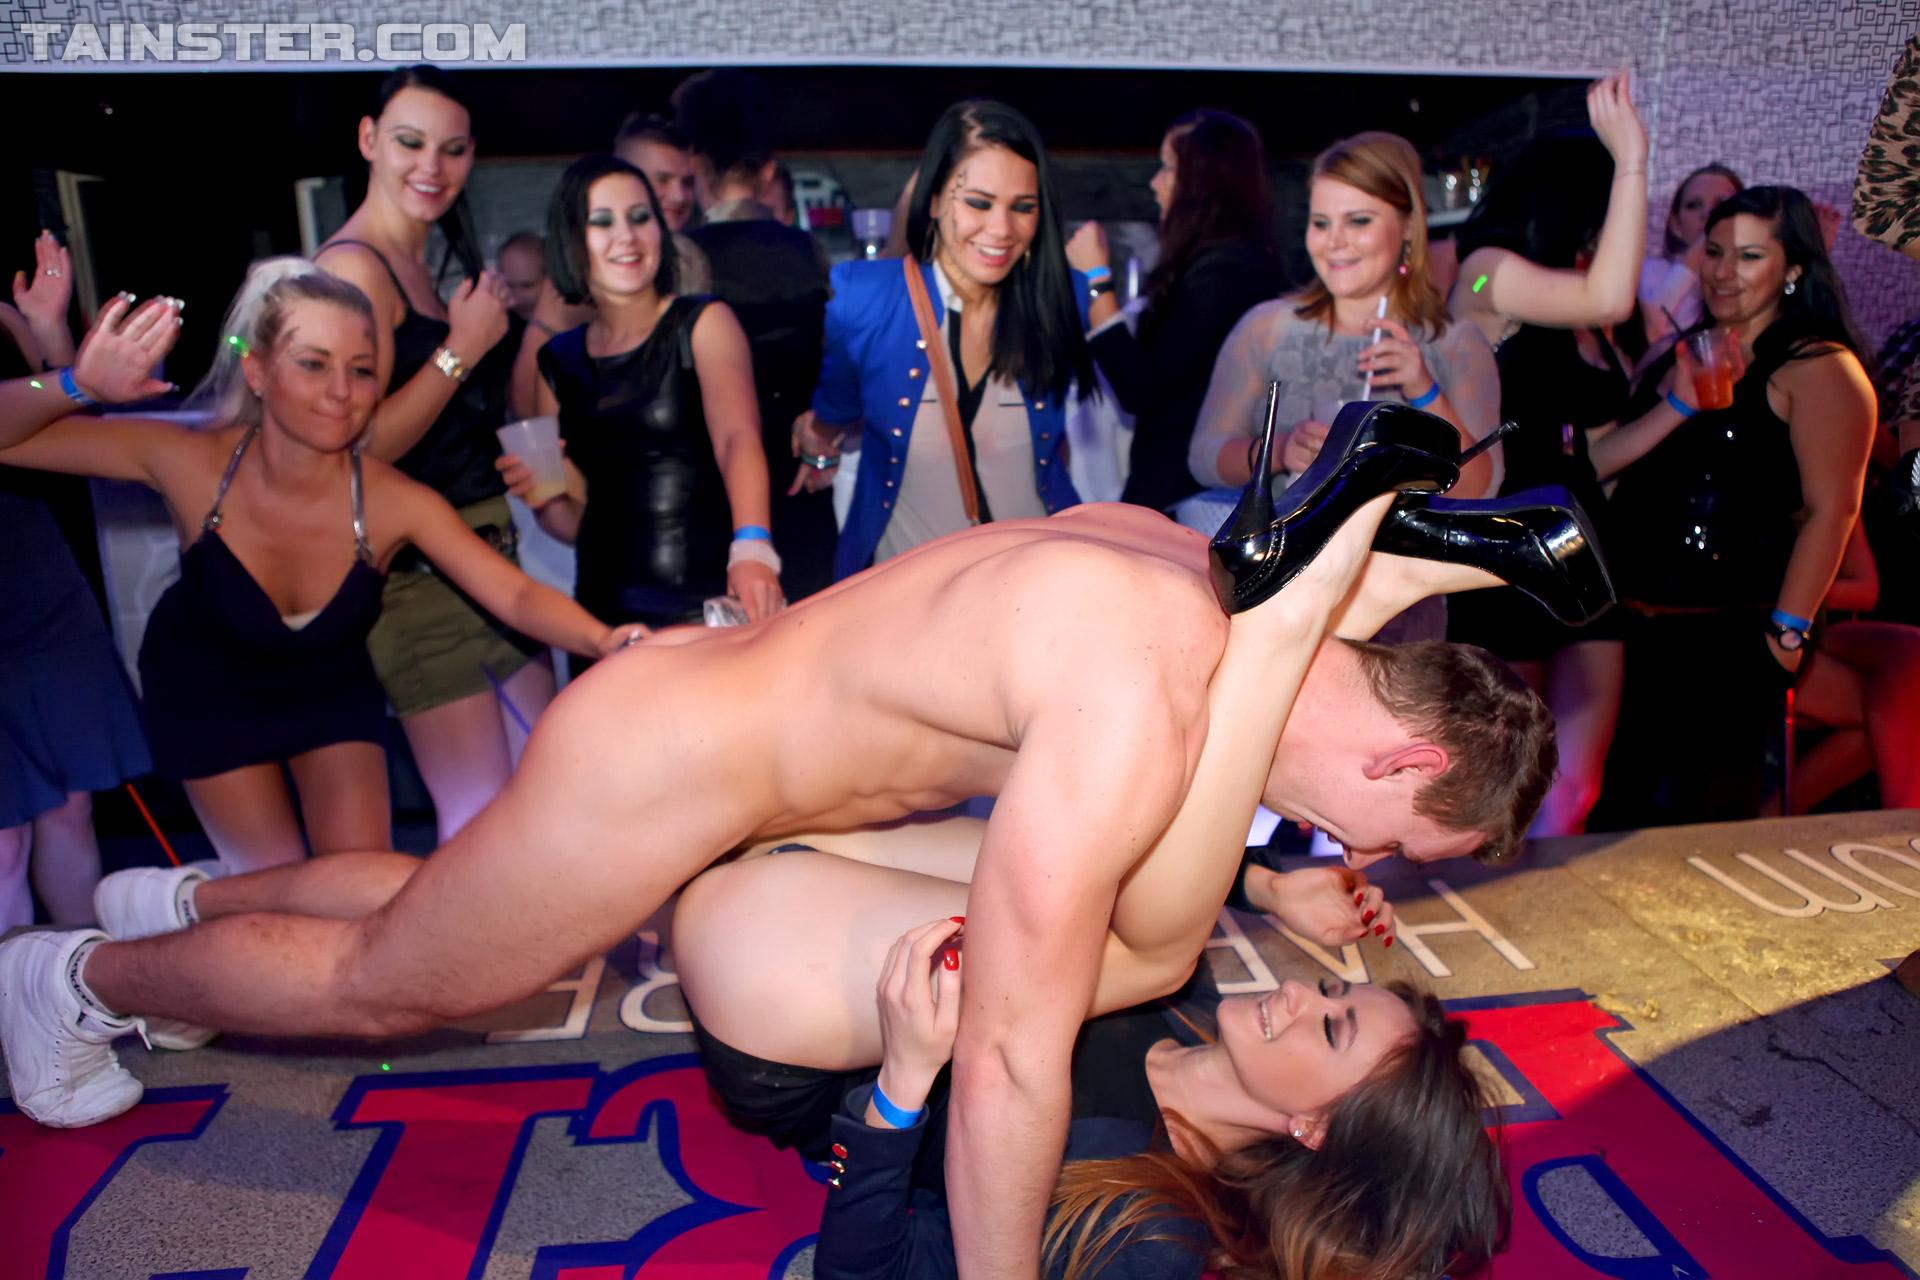 Секс пати вечеринка шоу фото 15 фотография